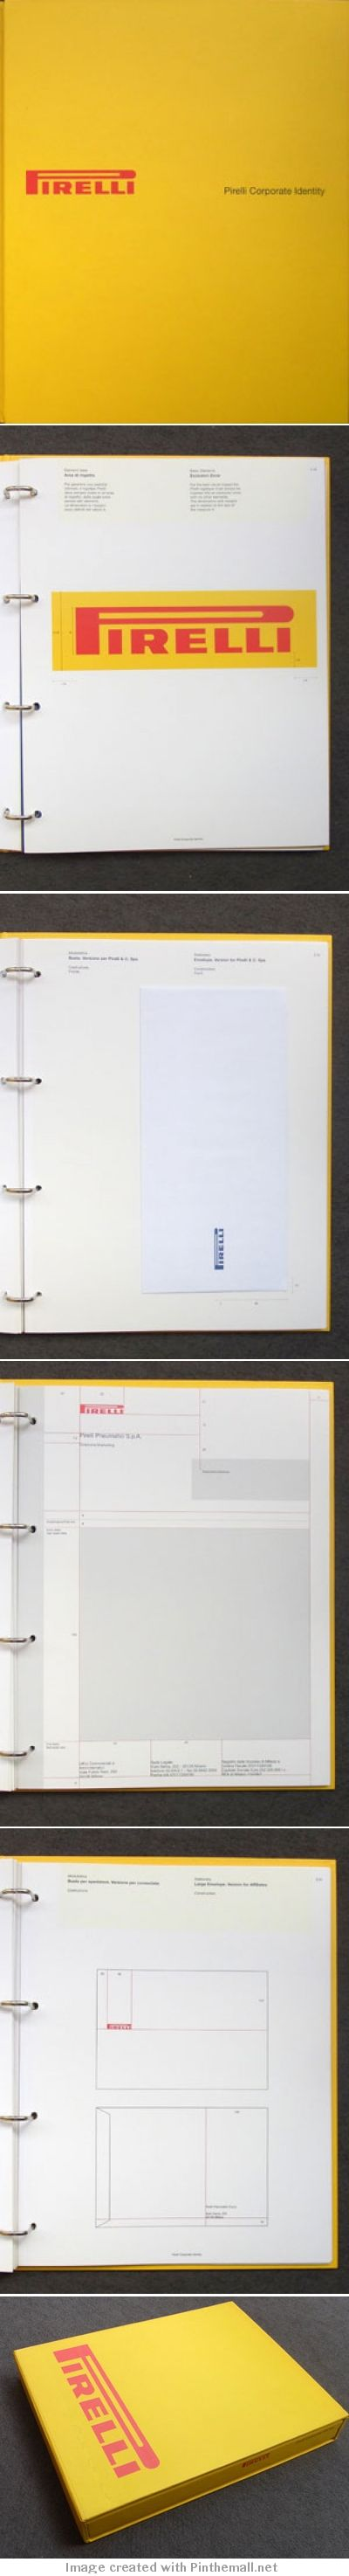 Pirelli Corporate Identity Manual